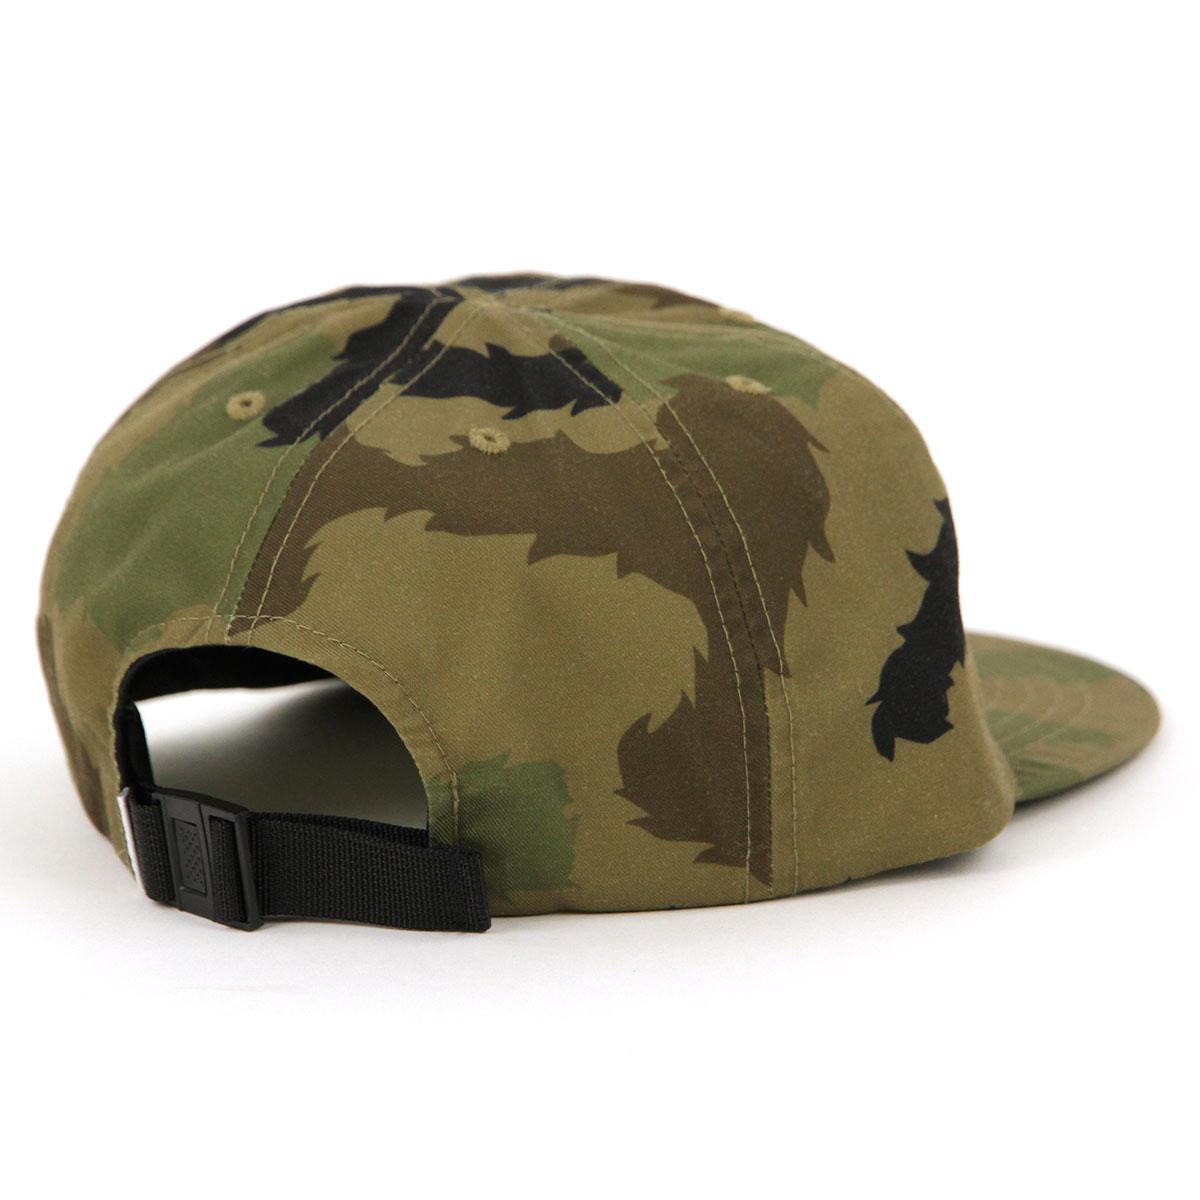 Polar POLER regular store cap hat BIG BILL FLOPSTER NYLON FLOPPY  31720001-OCO OLIVE FURRY CAMO b02378599e71